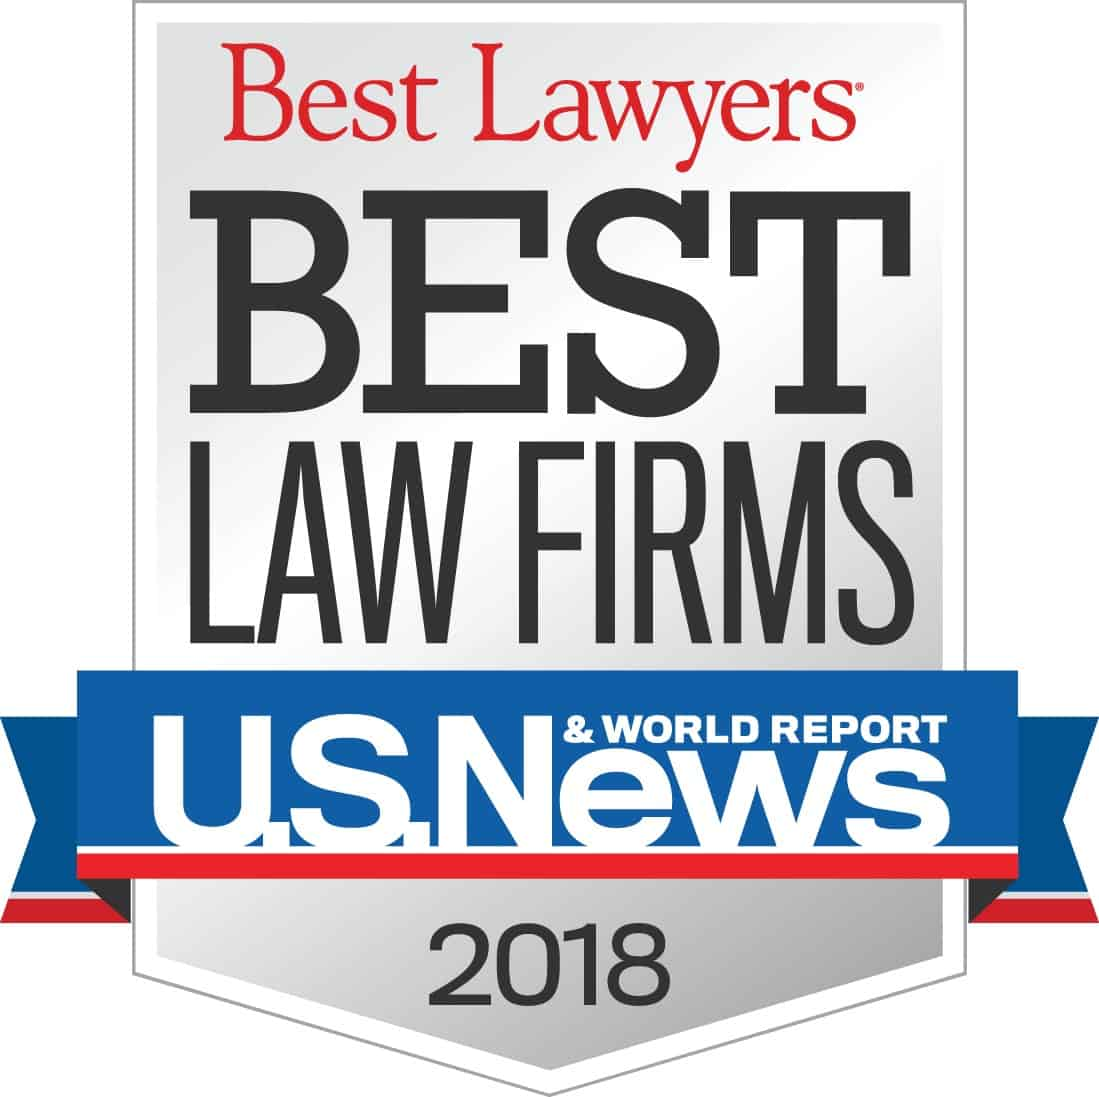 Best Lawyers - Best Law Firms